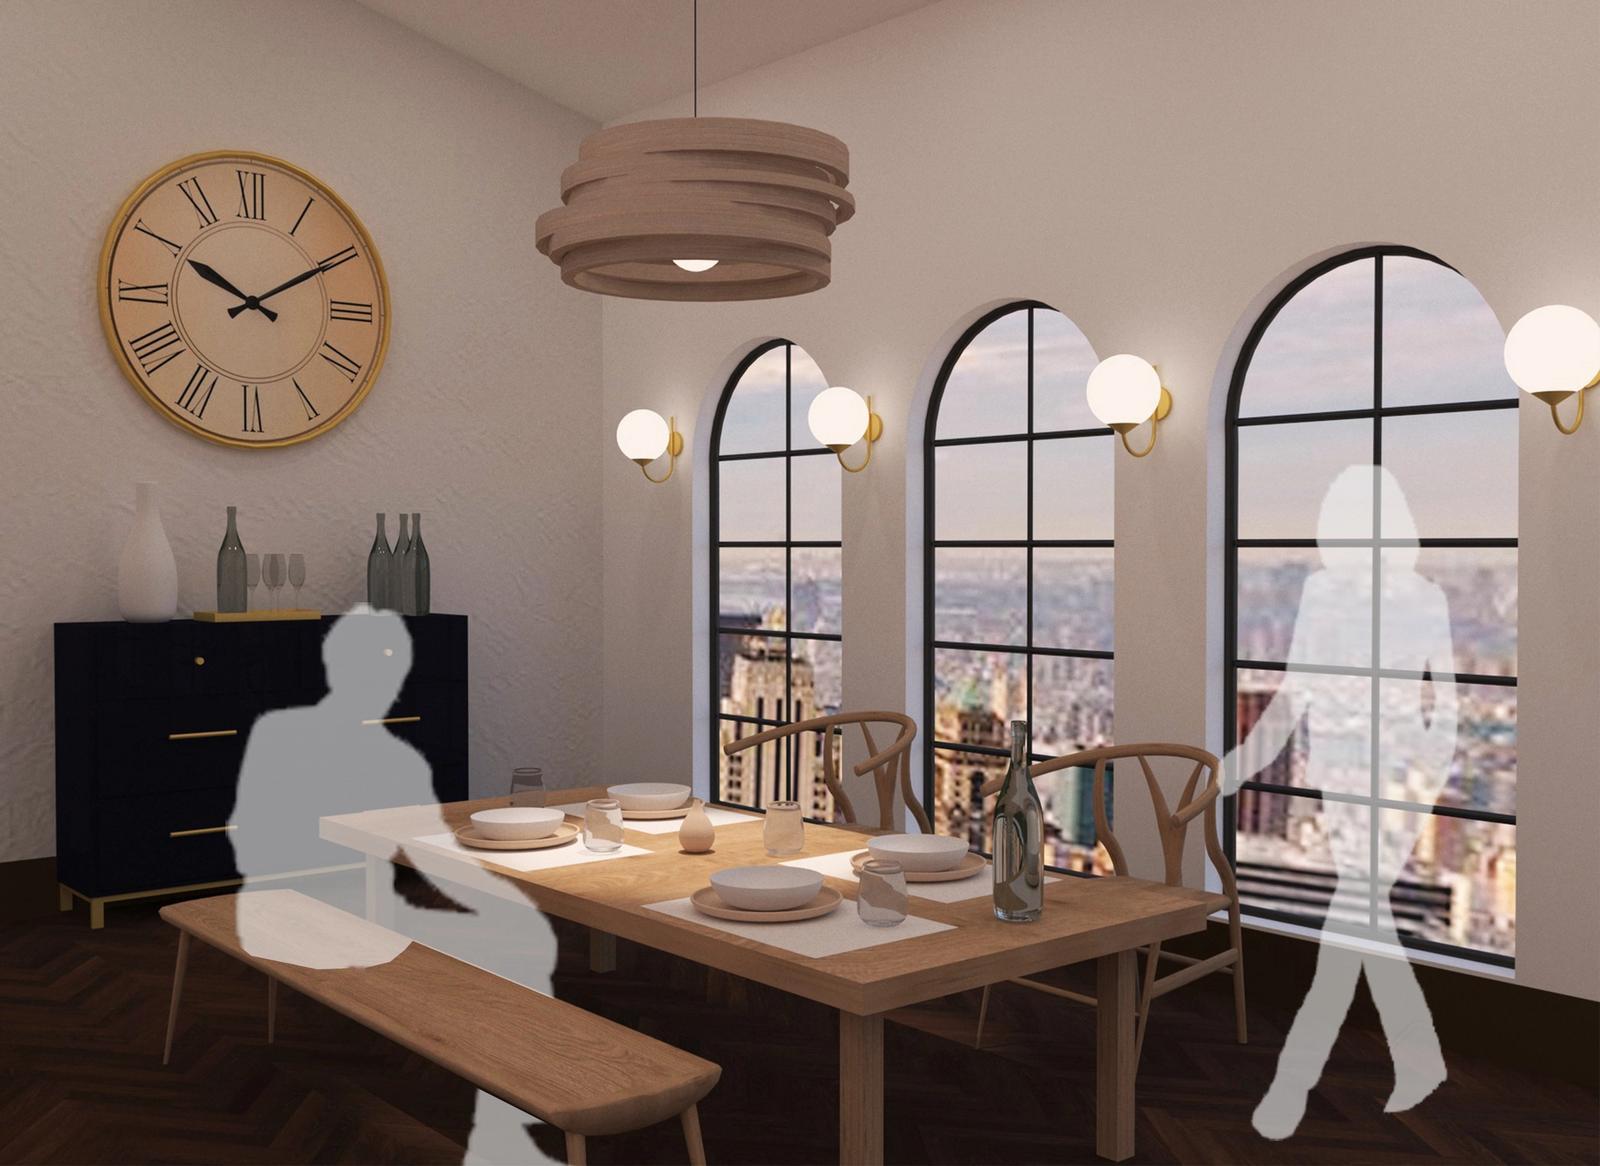 Artist Studio - Dining Area